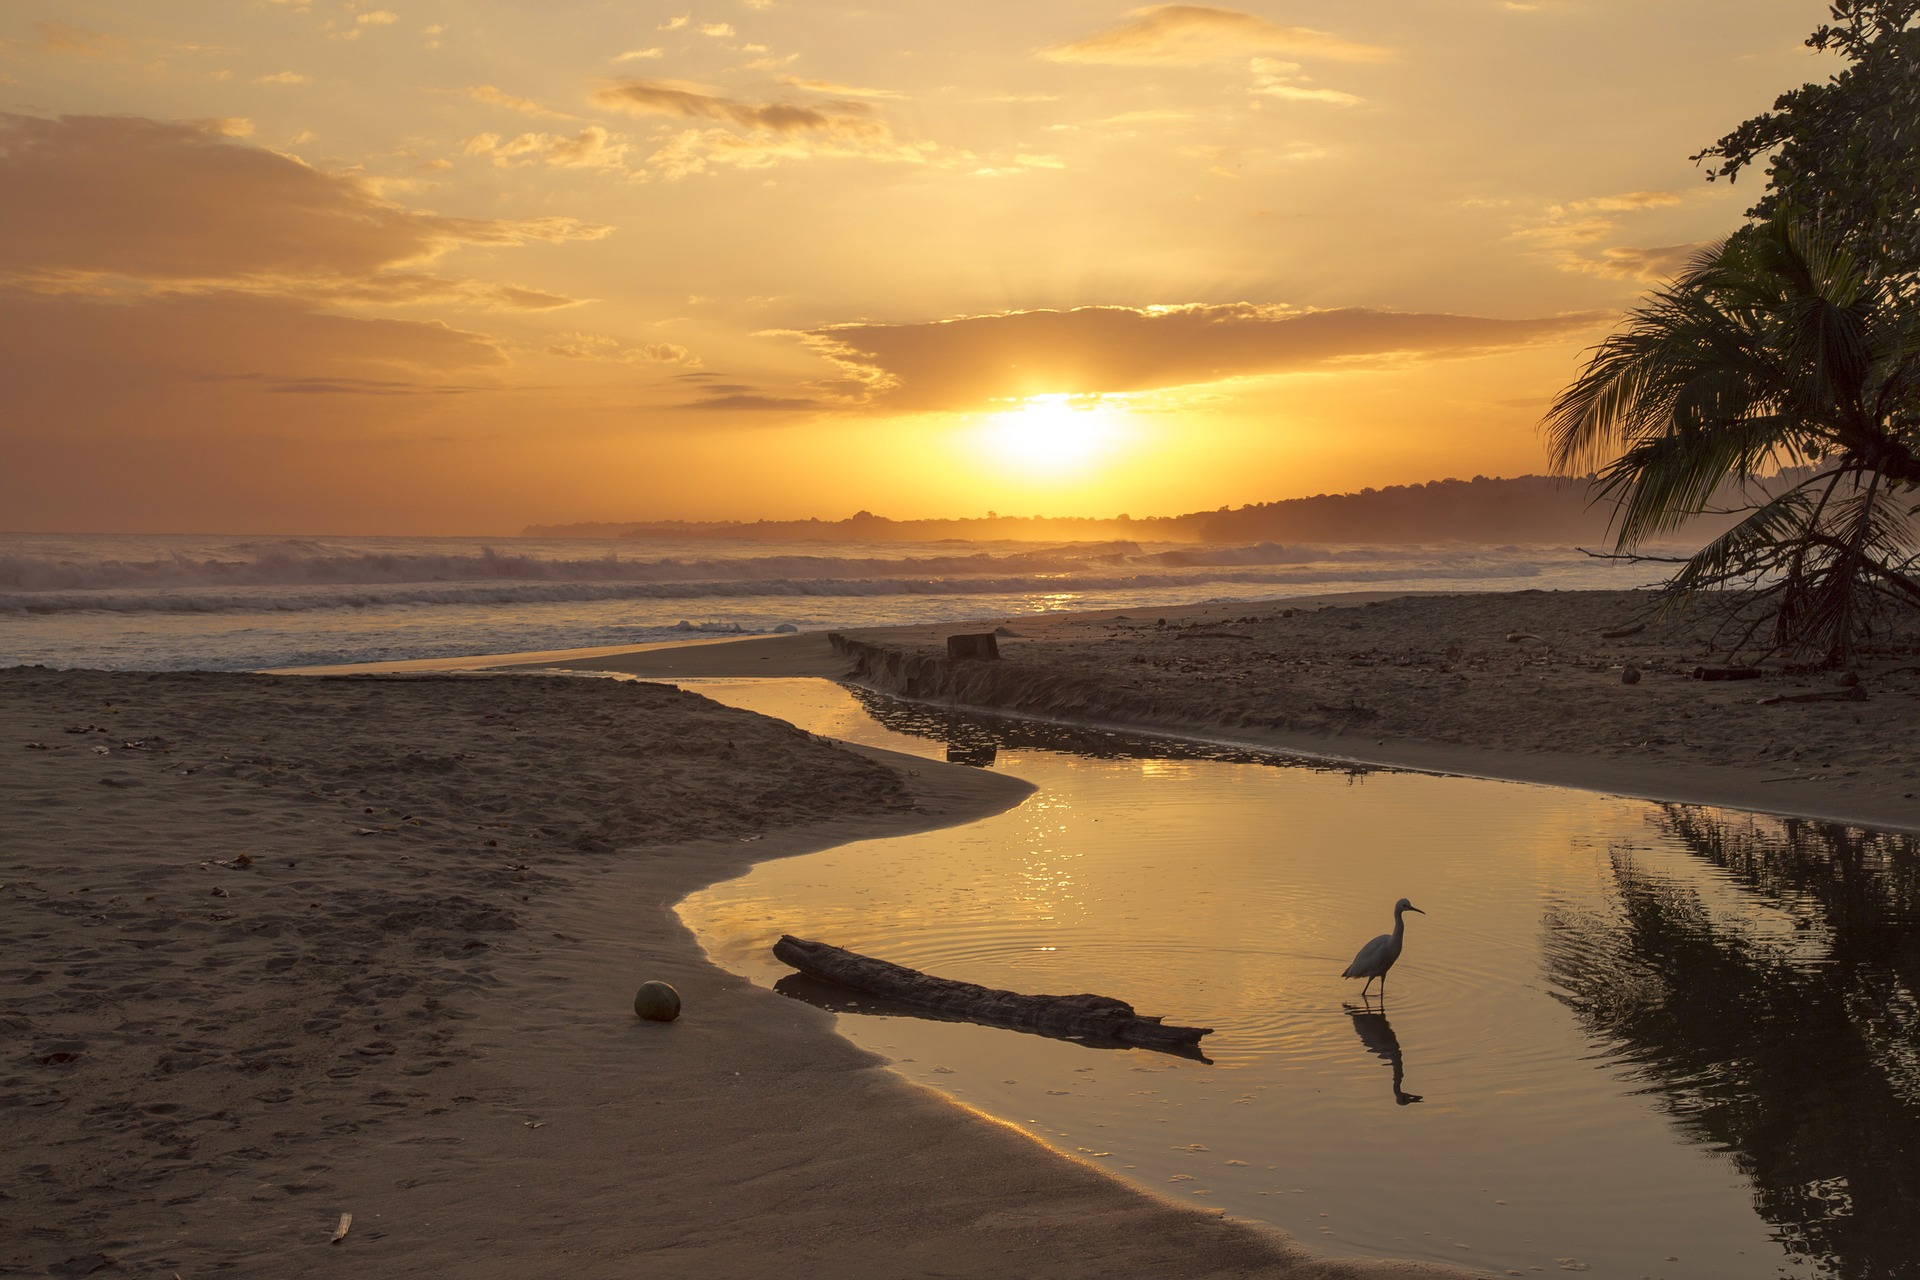 Sea in Costa Rica